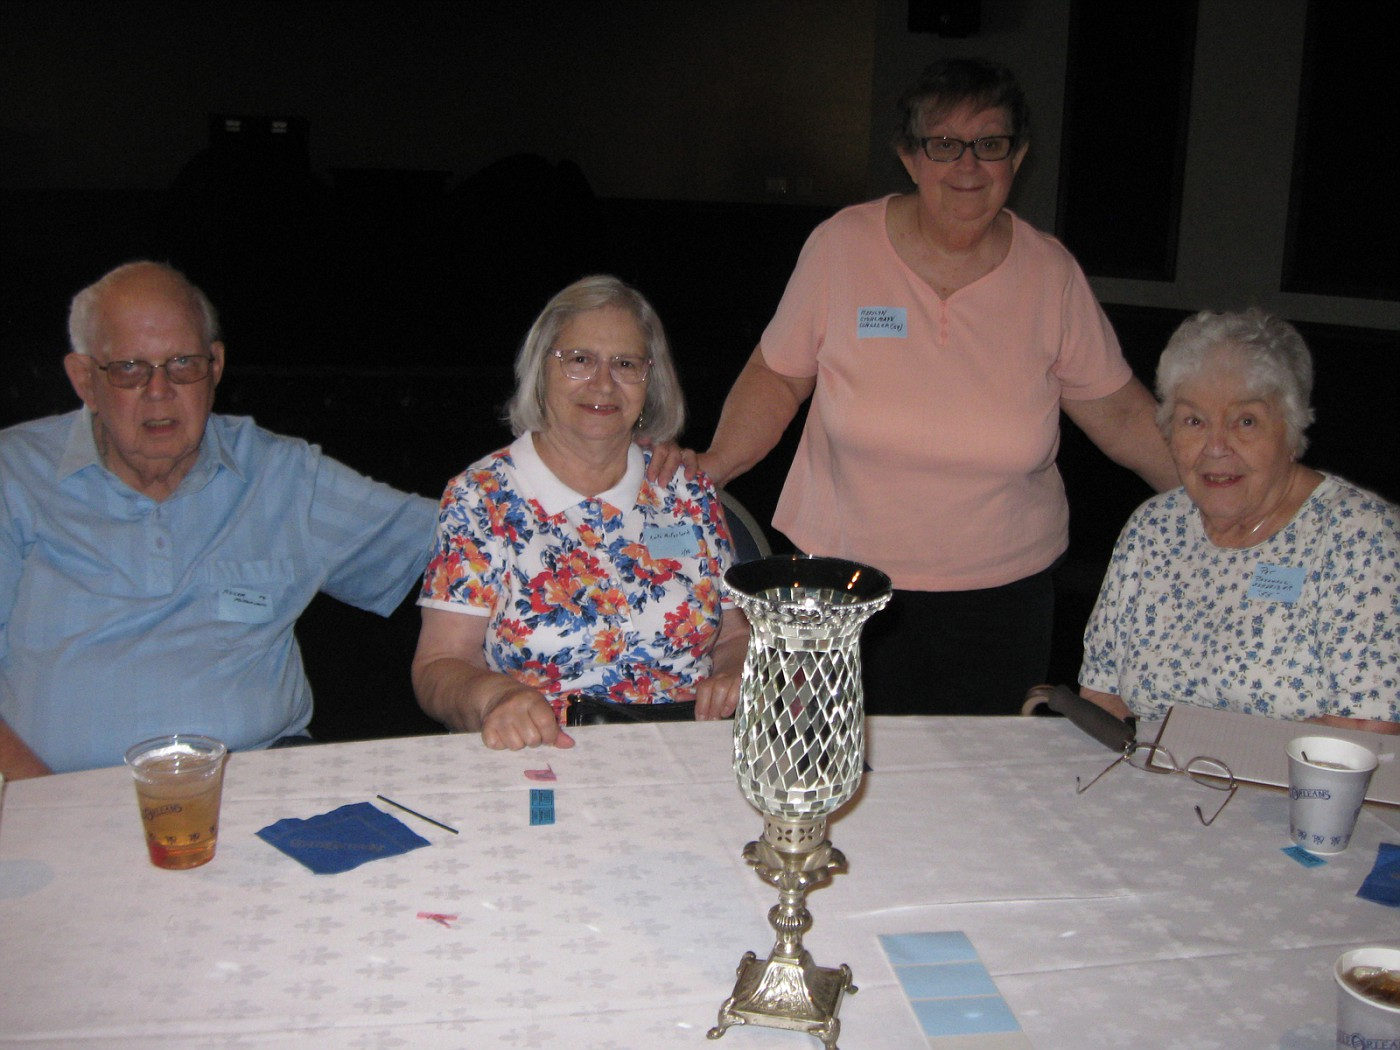 Roger & Anita McFarland, Marylyn Schiller, Pat Schneider